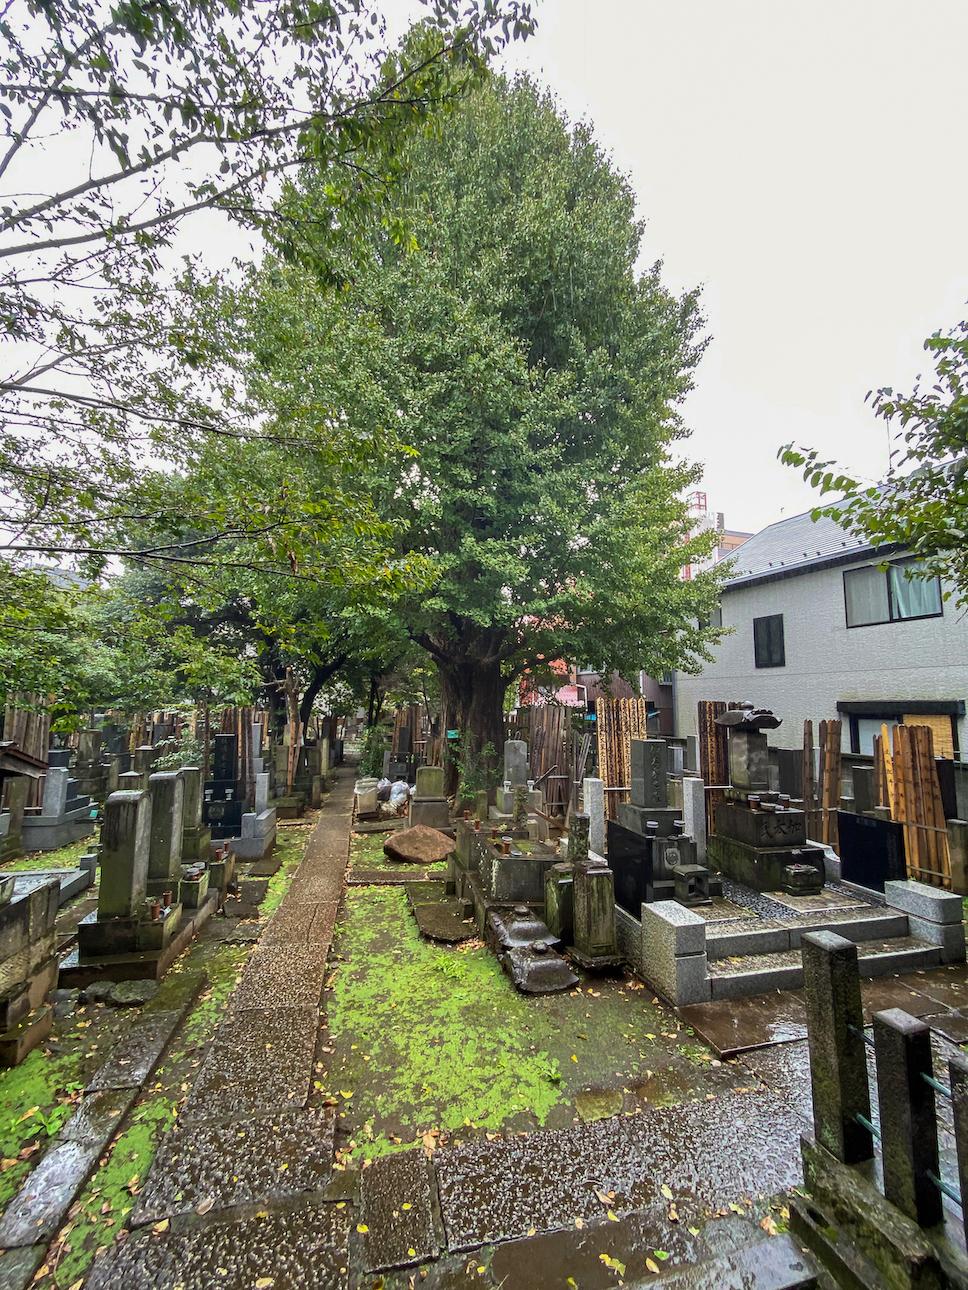 Friedhof vor dem Tempel Kōkoku-ji, hohe buddhistische Grabsteine, grüne Bäume, nasser Asphalt